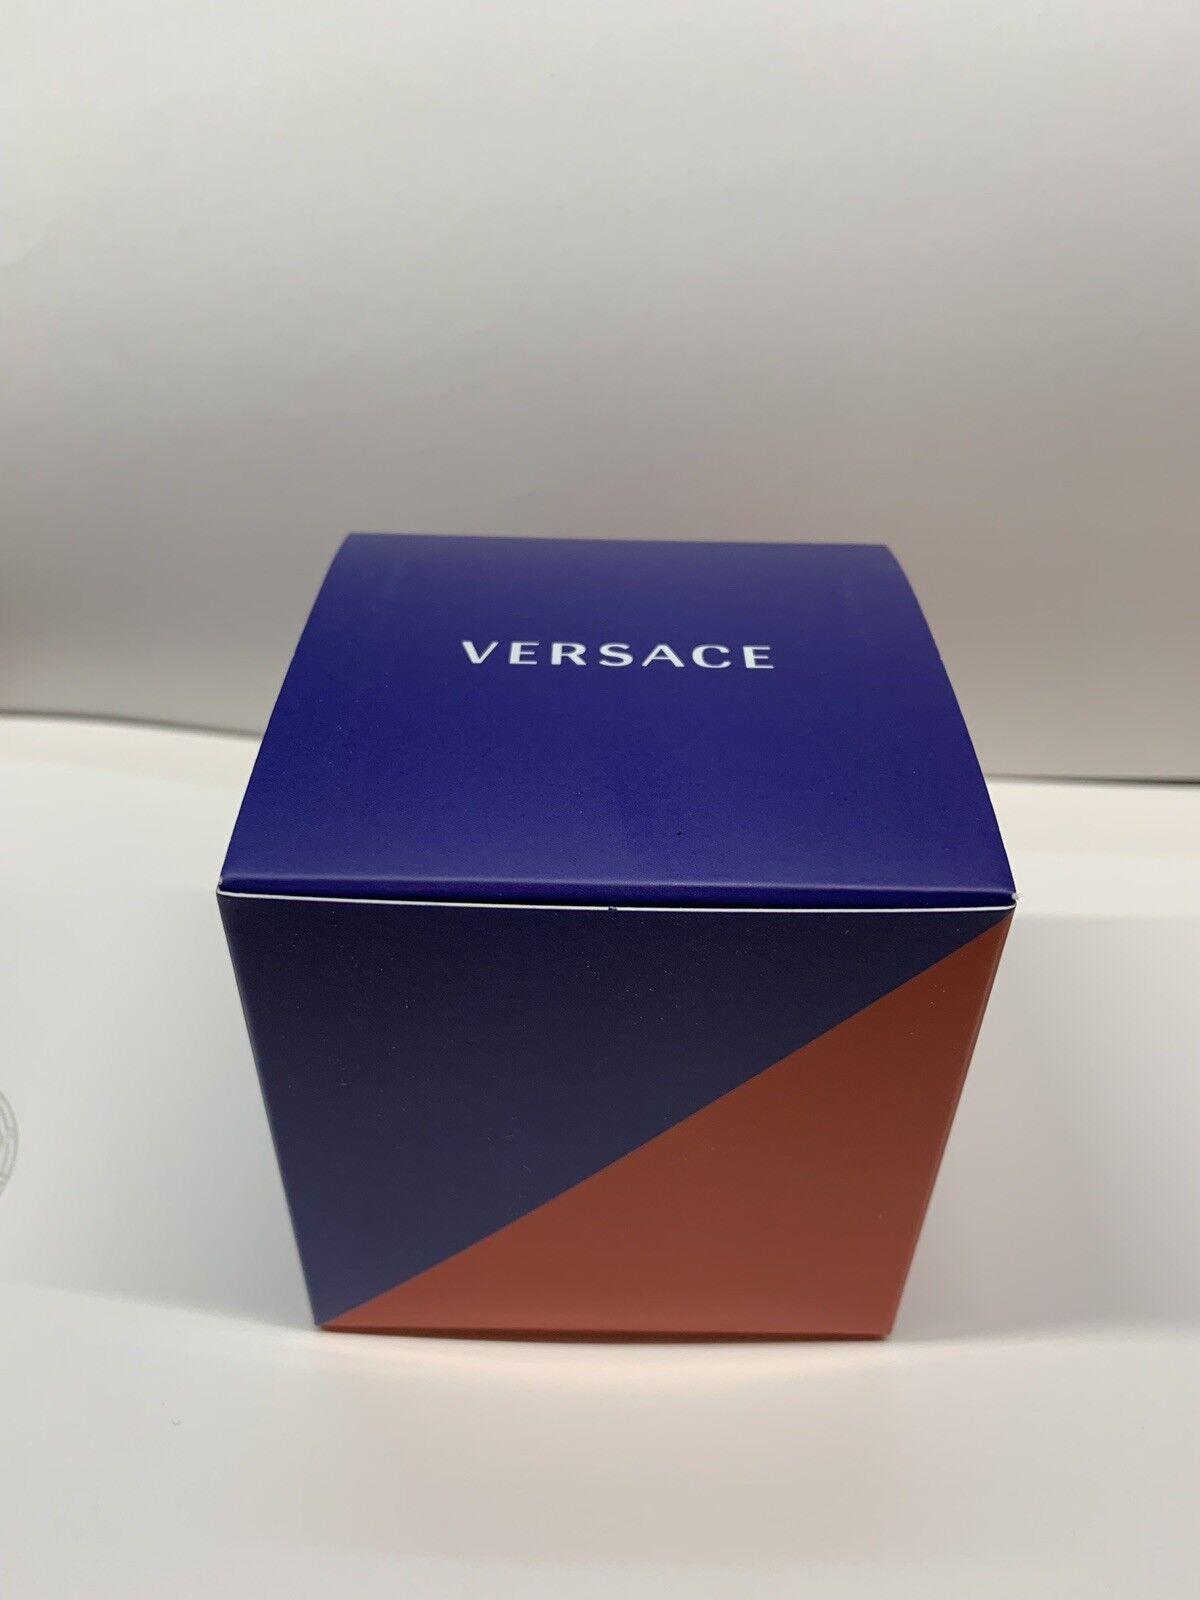 Versace Decroctive Holiday Rubik Cube